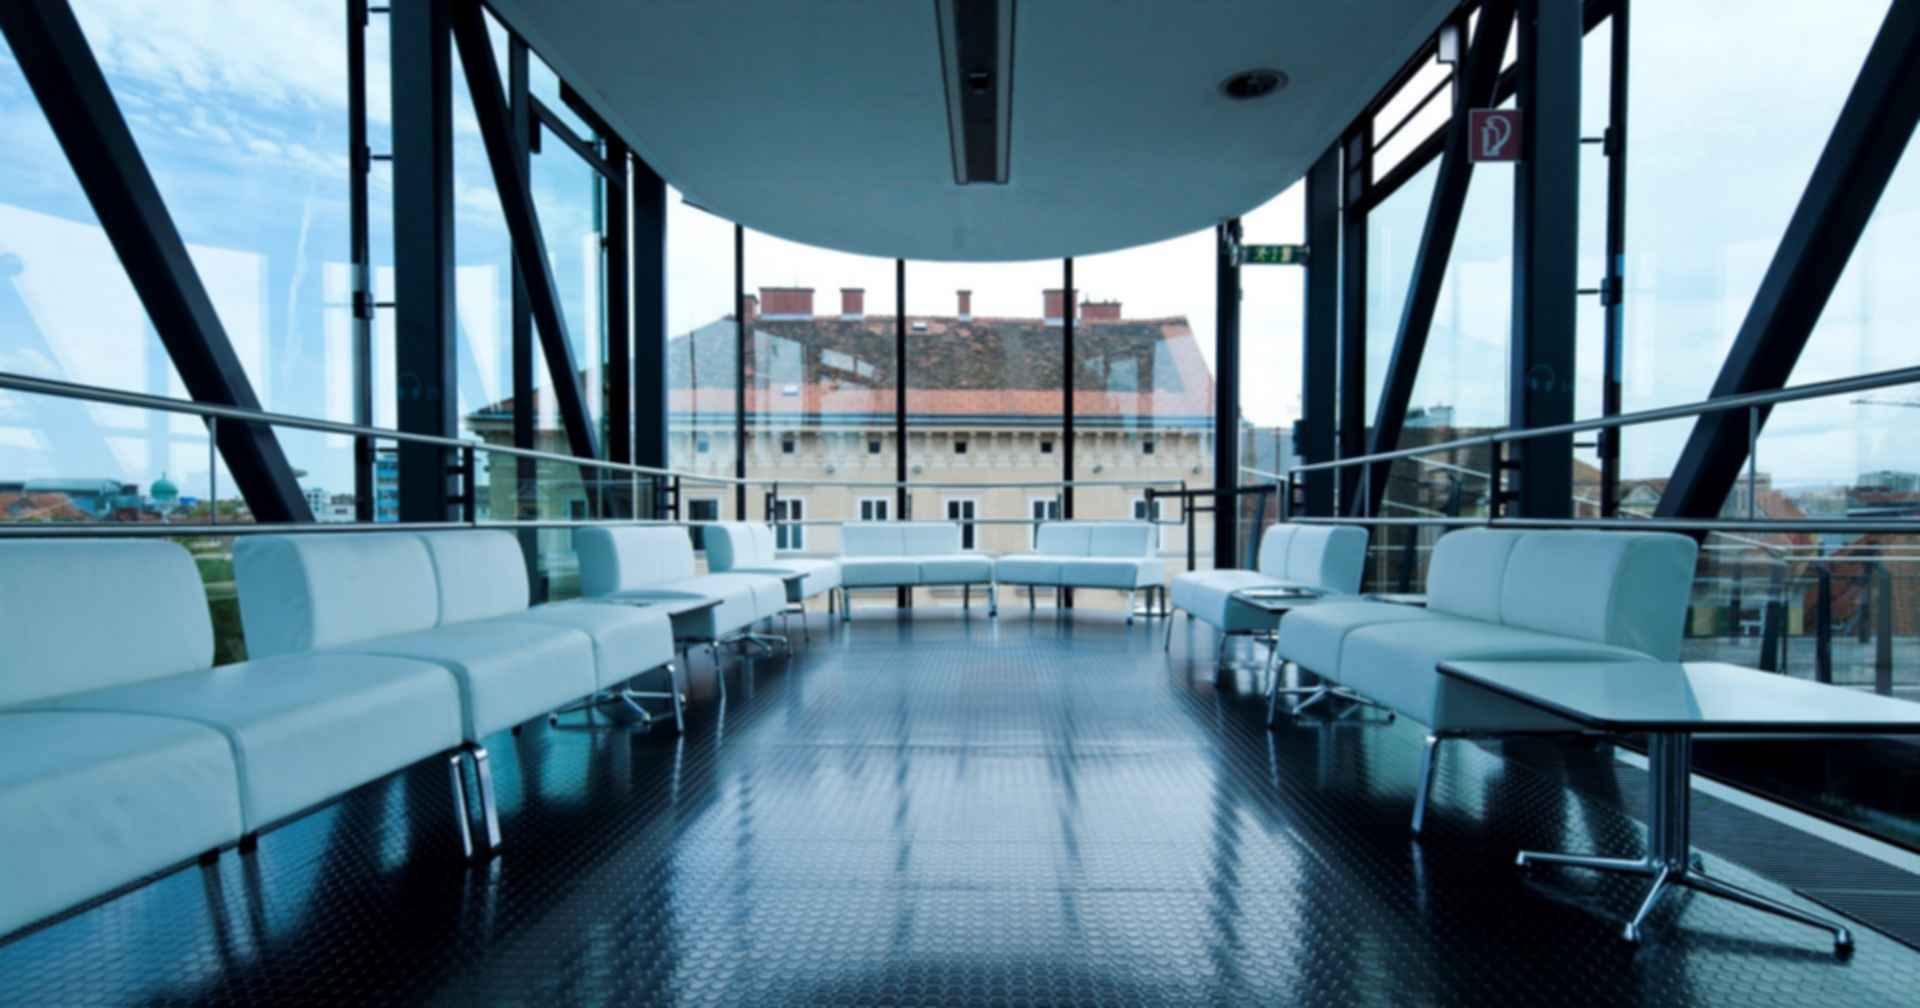 Kunsthaus Graz - Interior